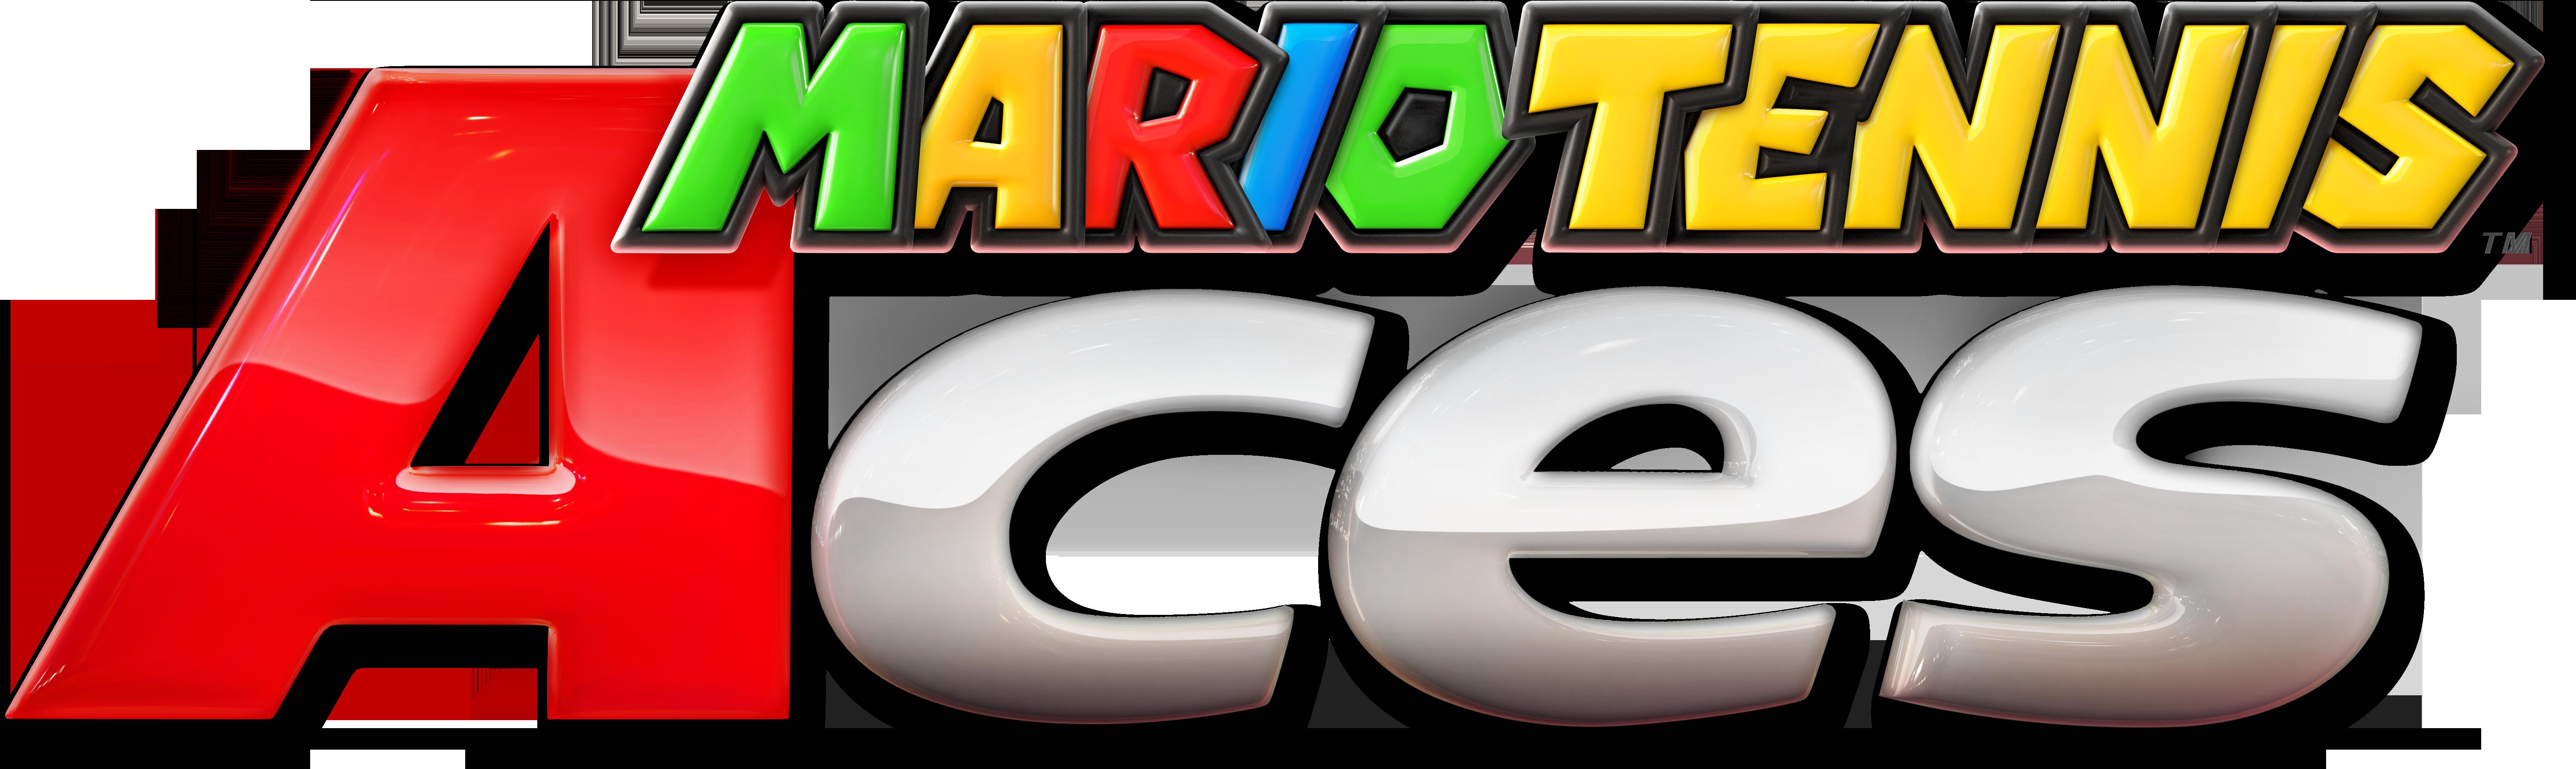 Mario Tennis Aces Logo PNG Image